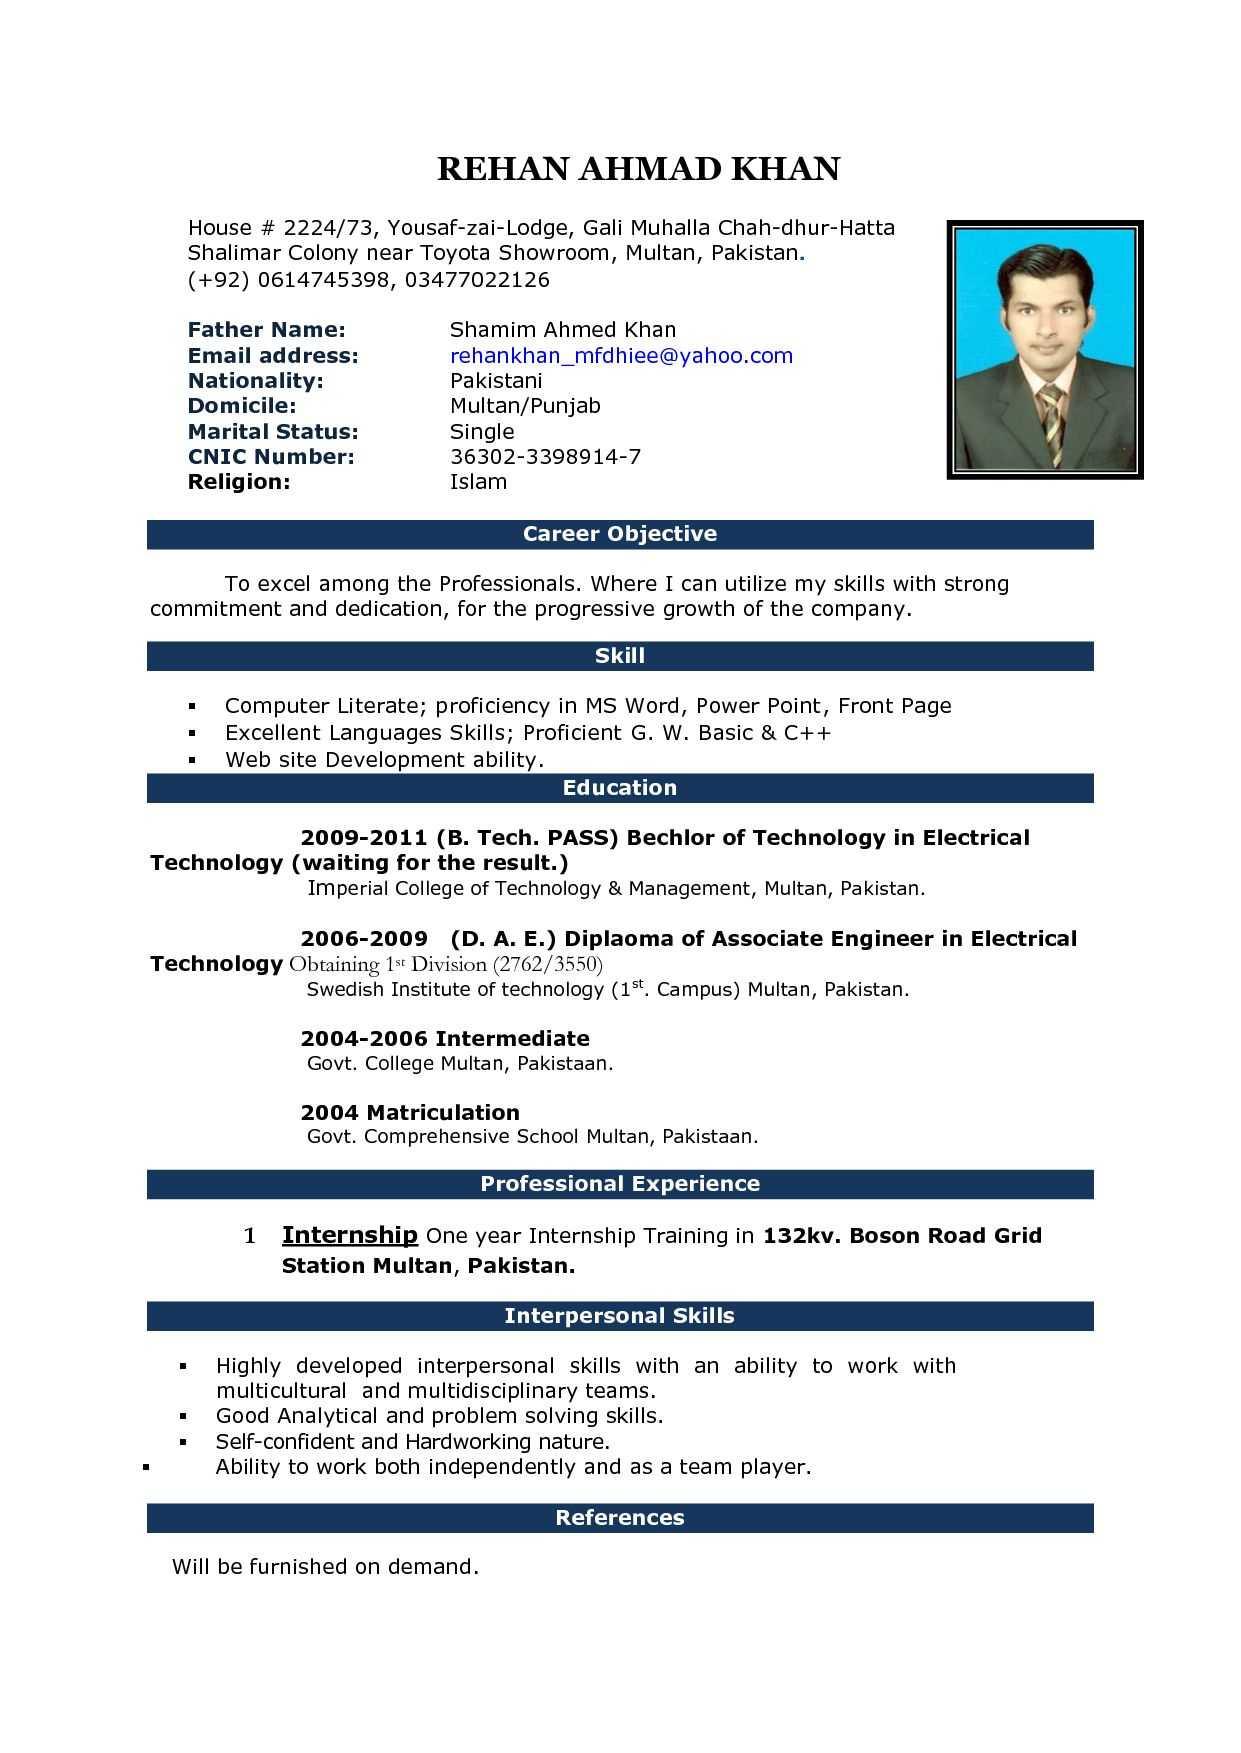 Free Download Cv Format In Ms Word Fieldstationco Microsoft Inside Free Basic Resume Templates Microsoft Word